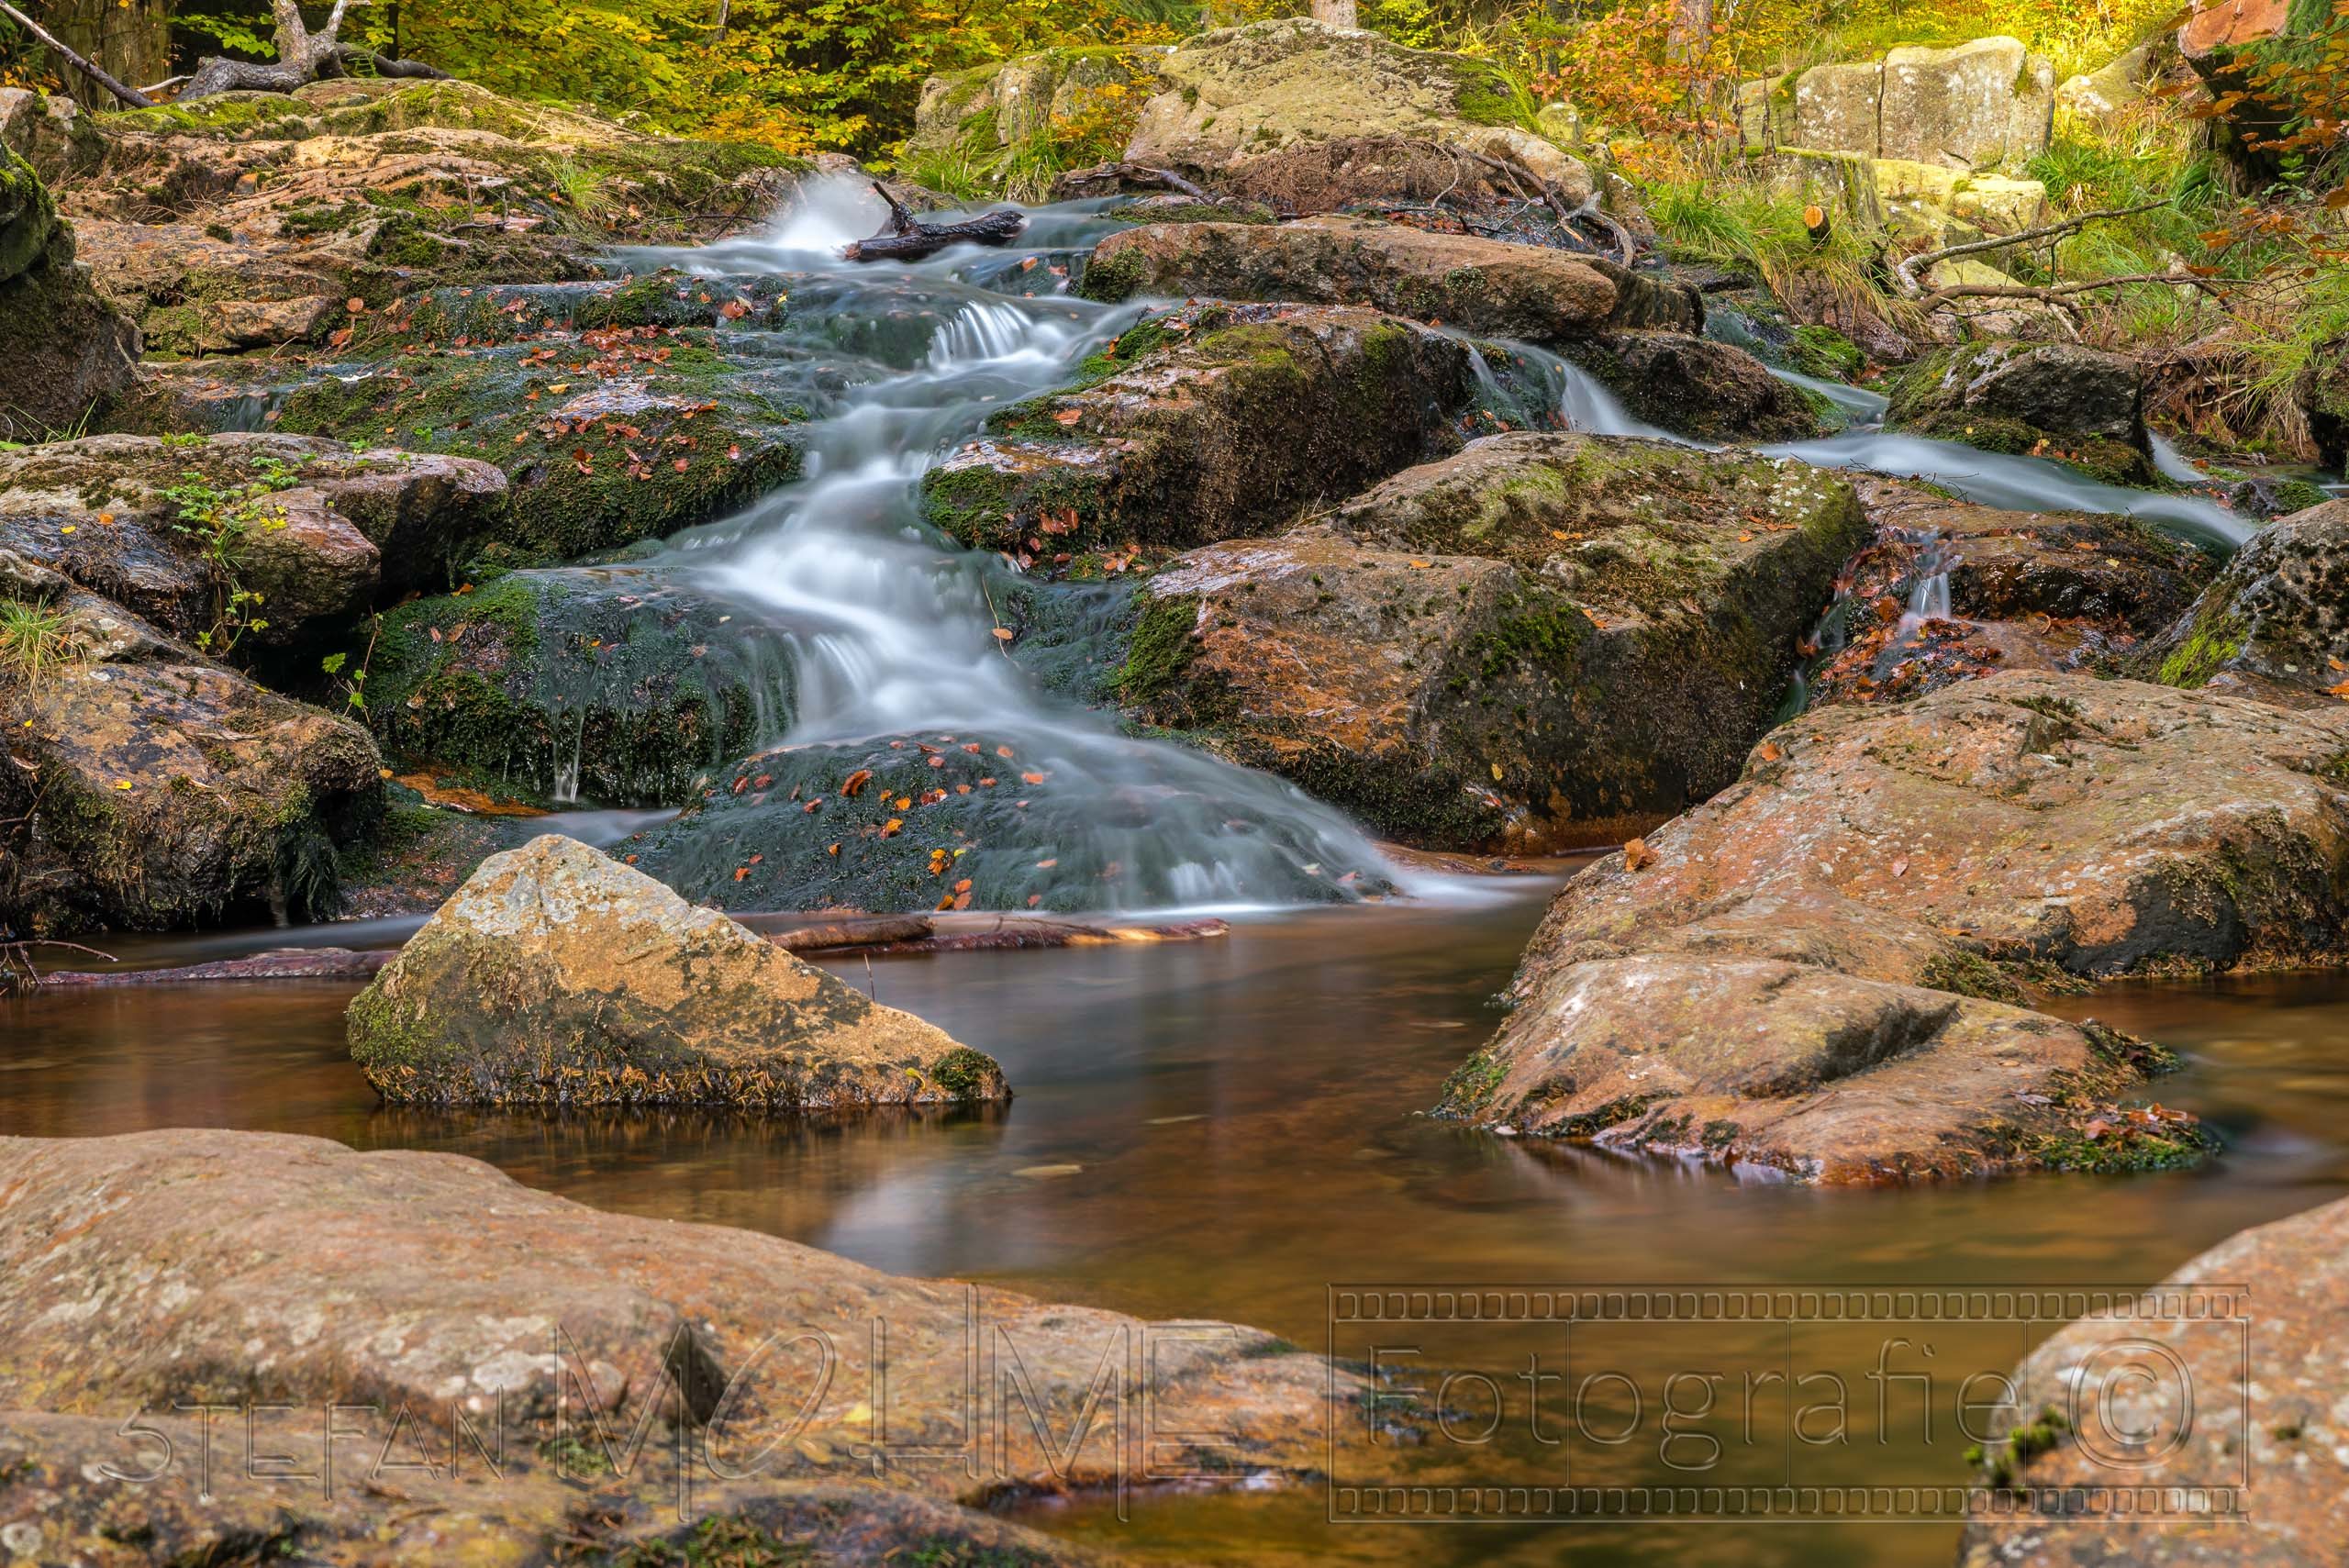 harz,landschaft,natur,,wald,baeume,blaetter,wasser,fluss,graufilter,langzeitbelichtung